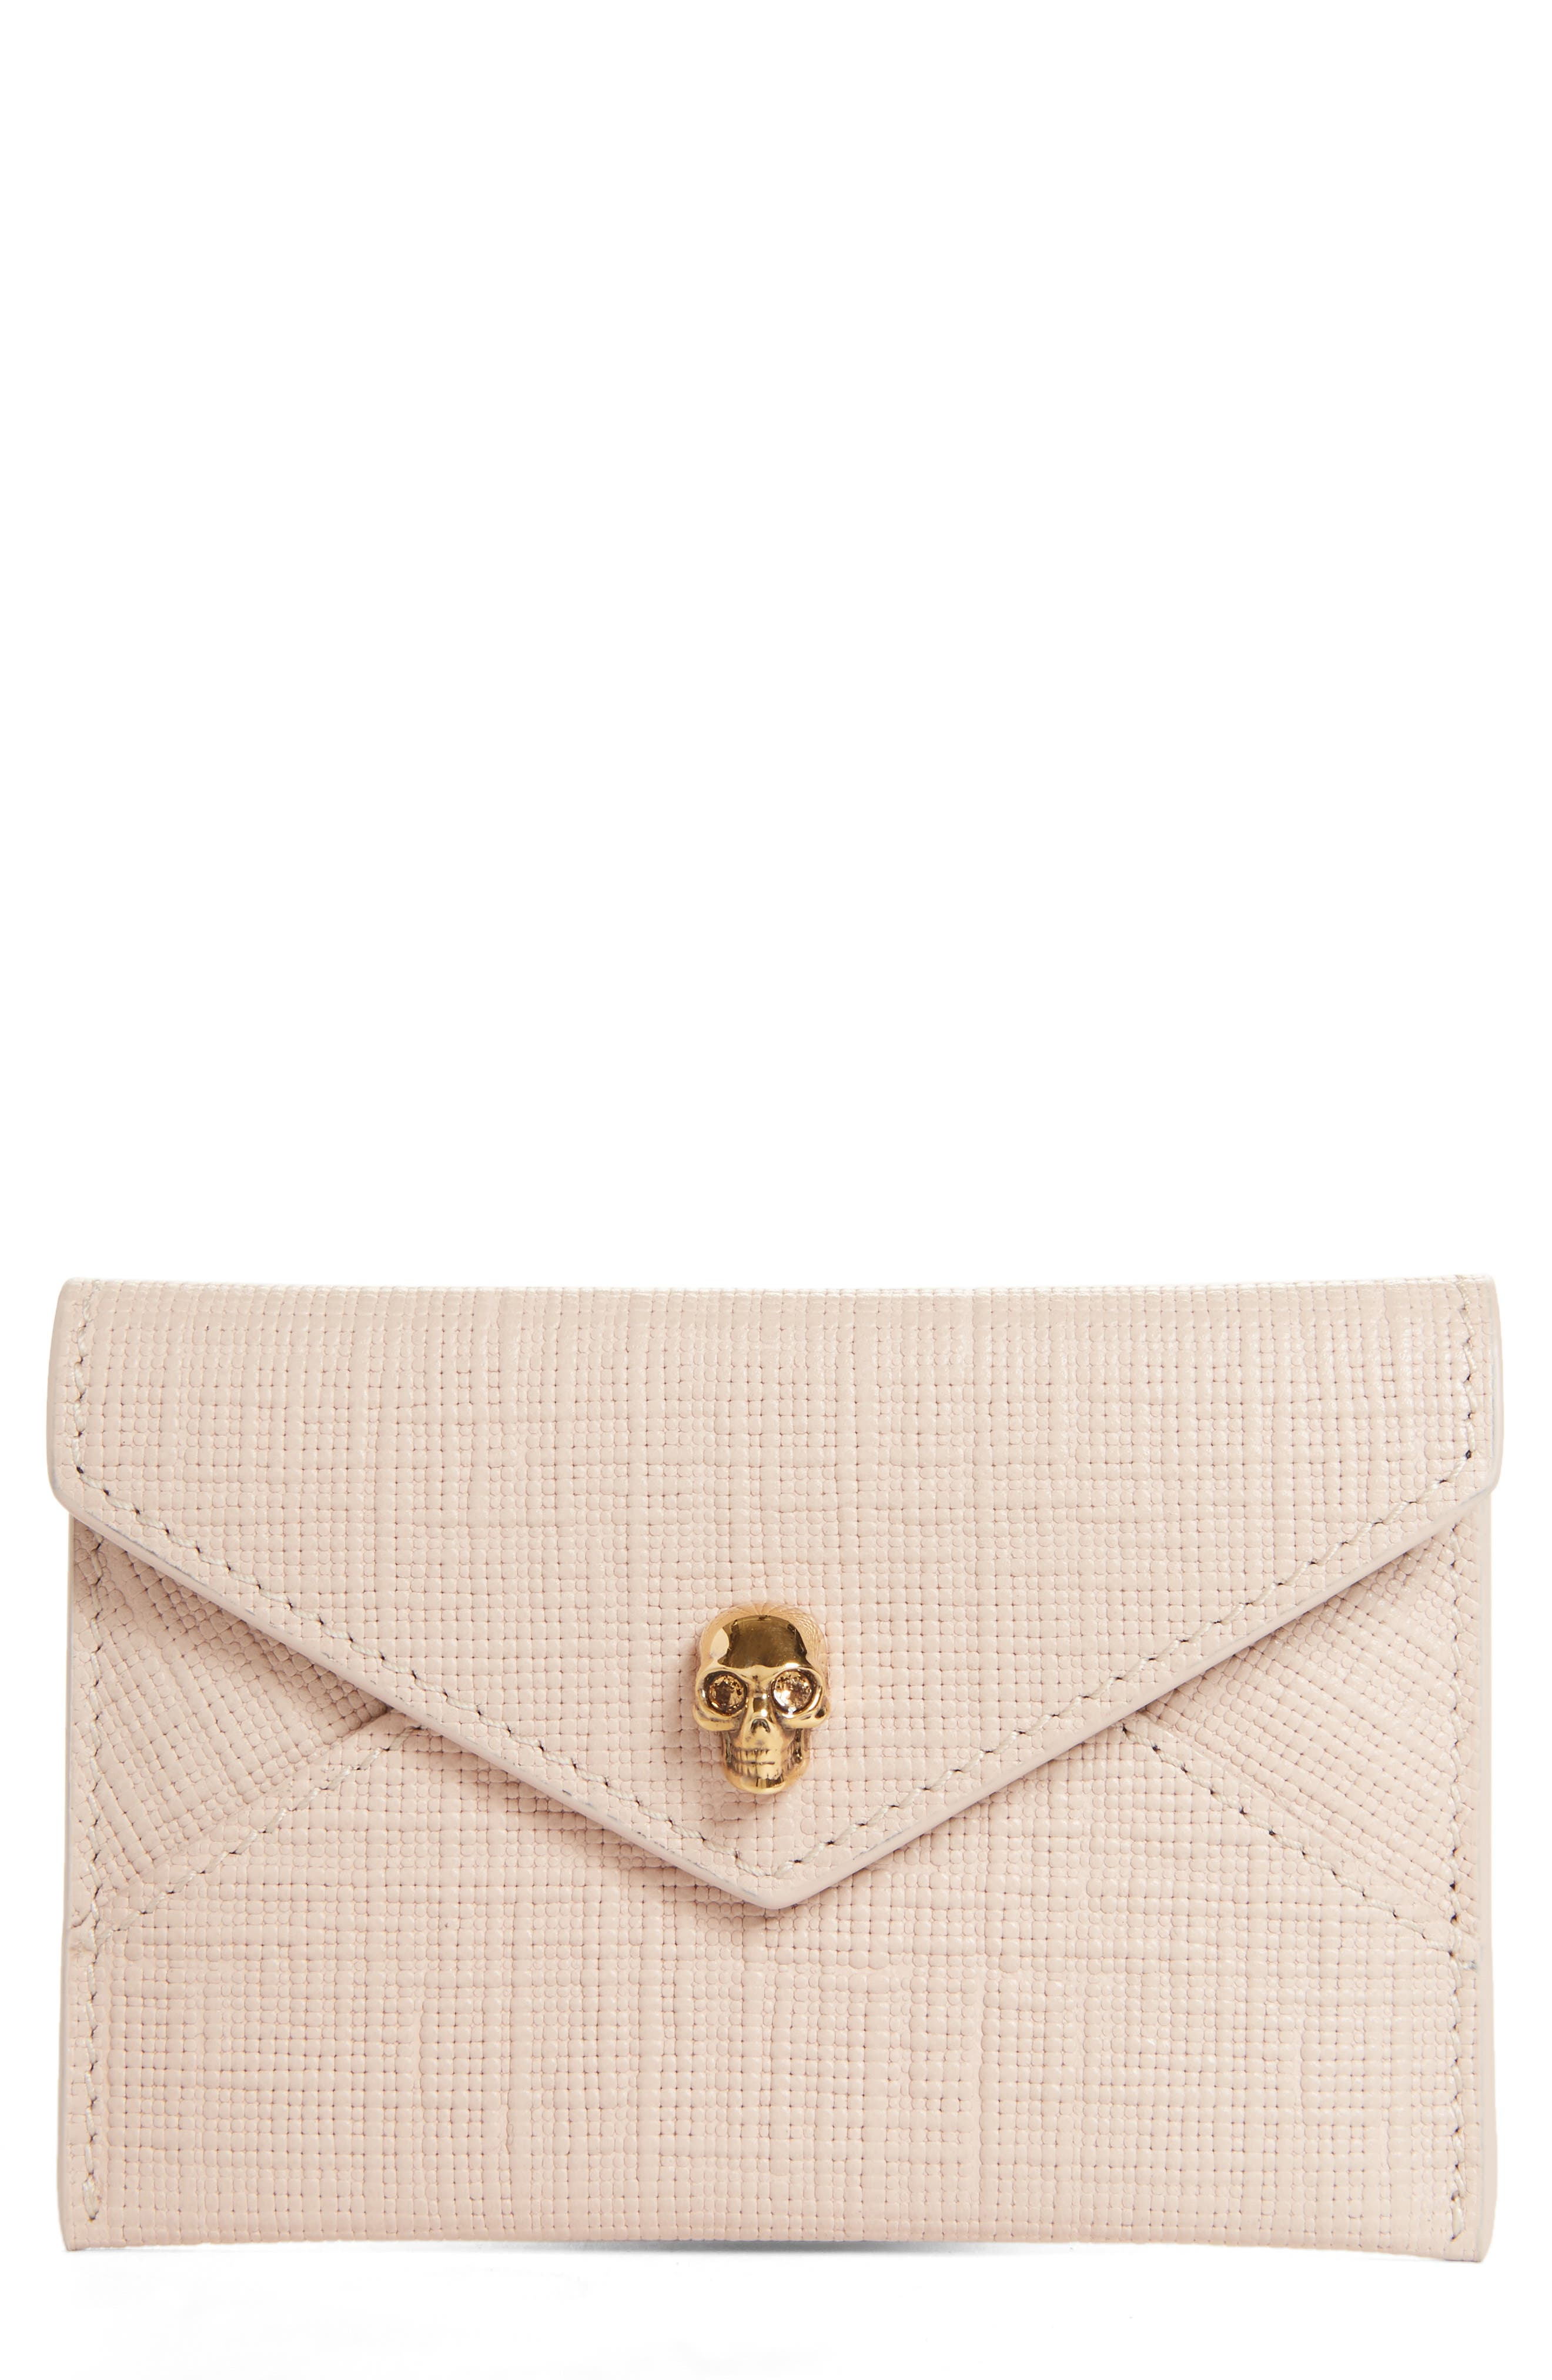 ALEXANDER MCQUEEN Embossed Leather Envelope Card Case